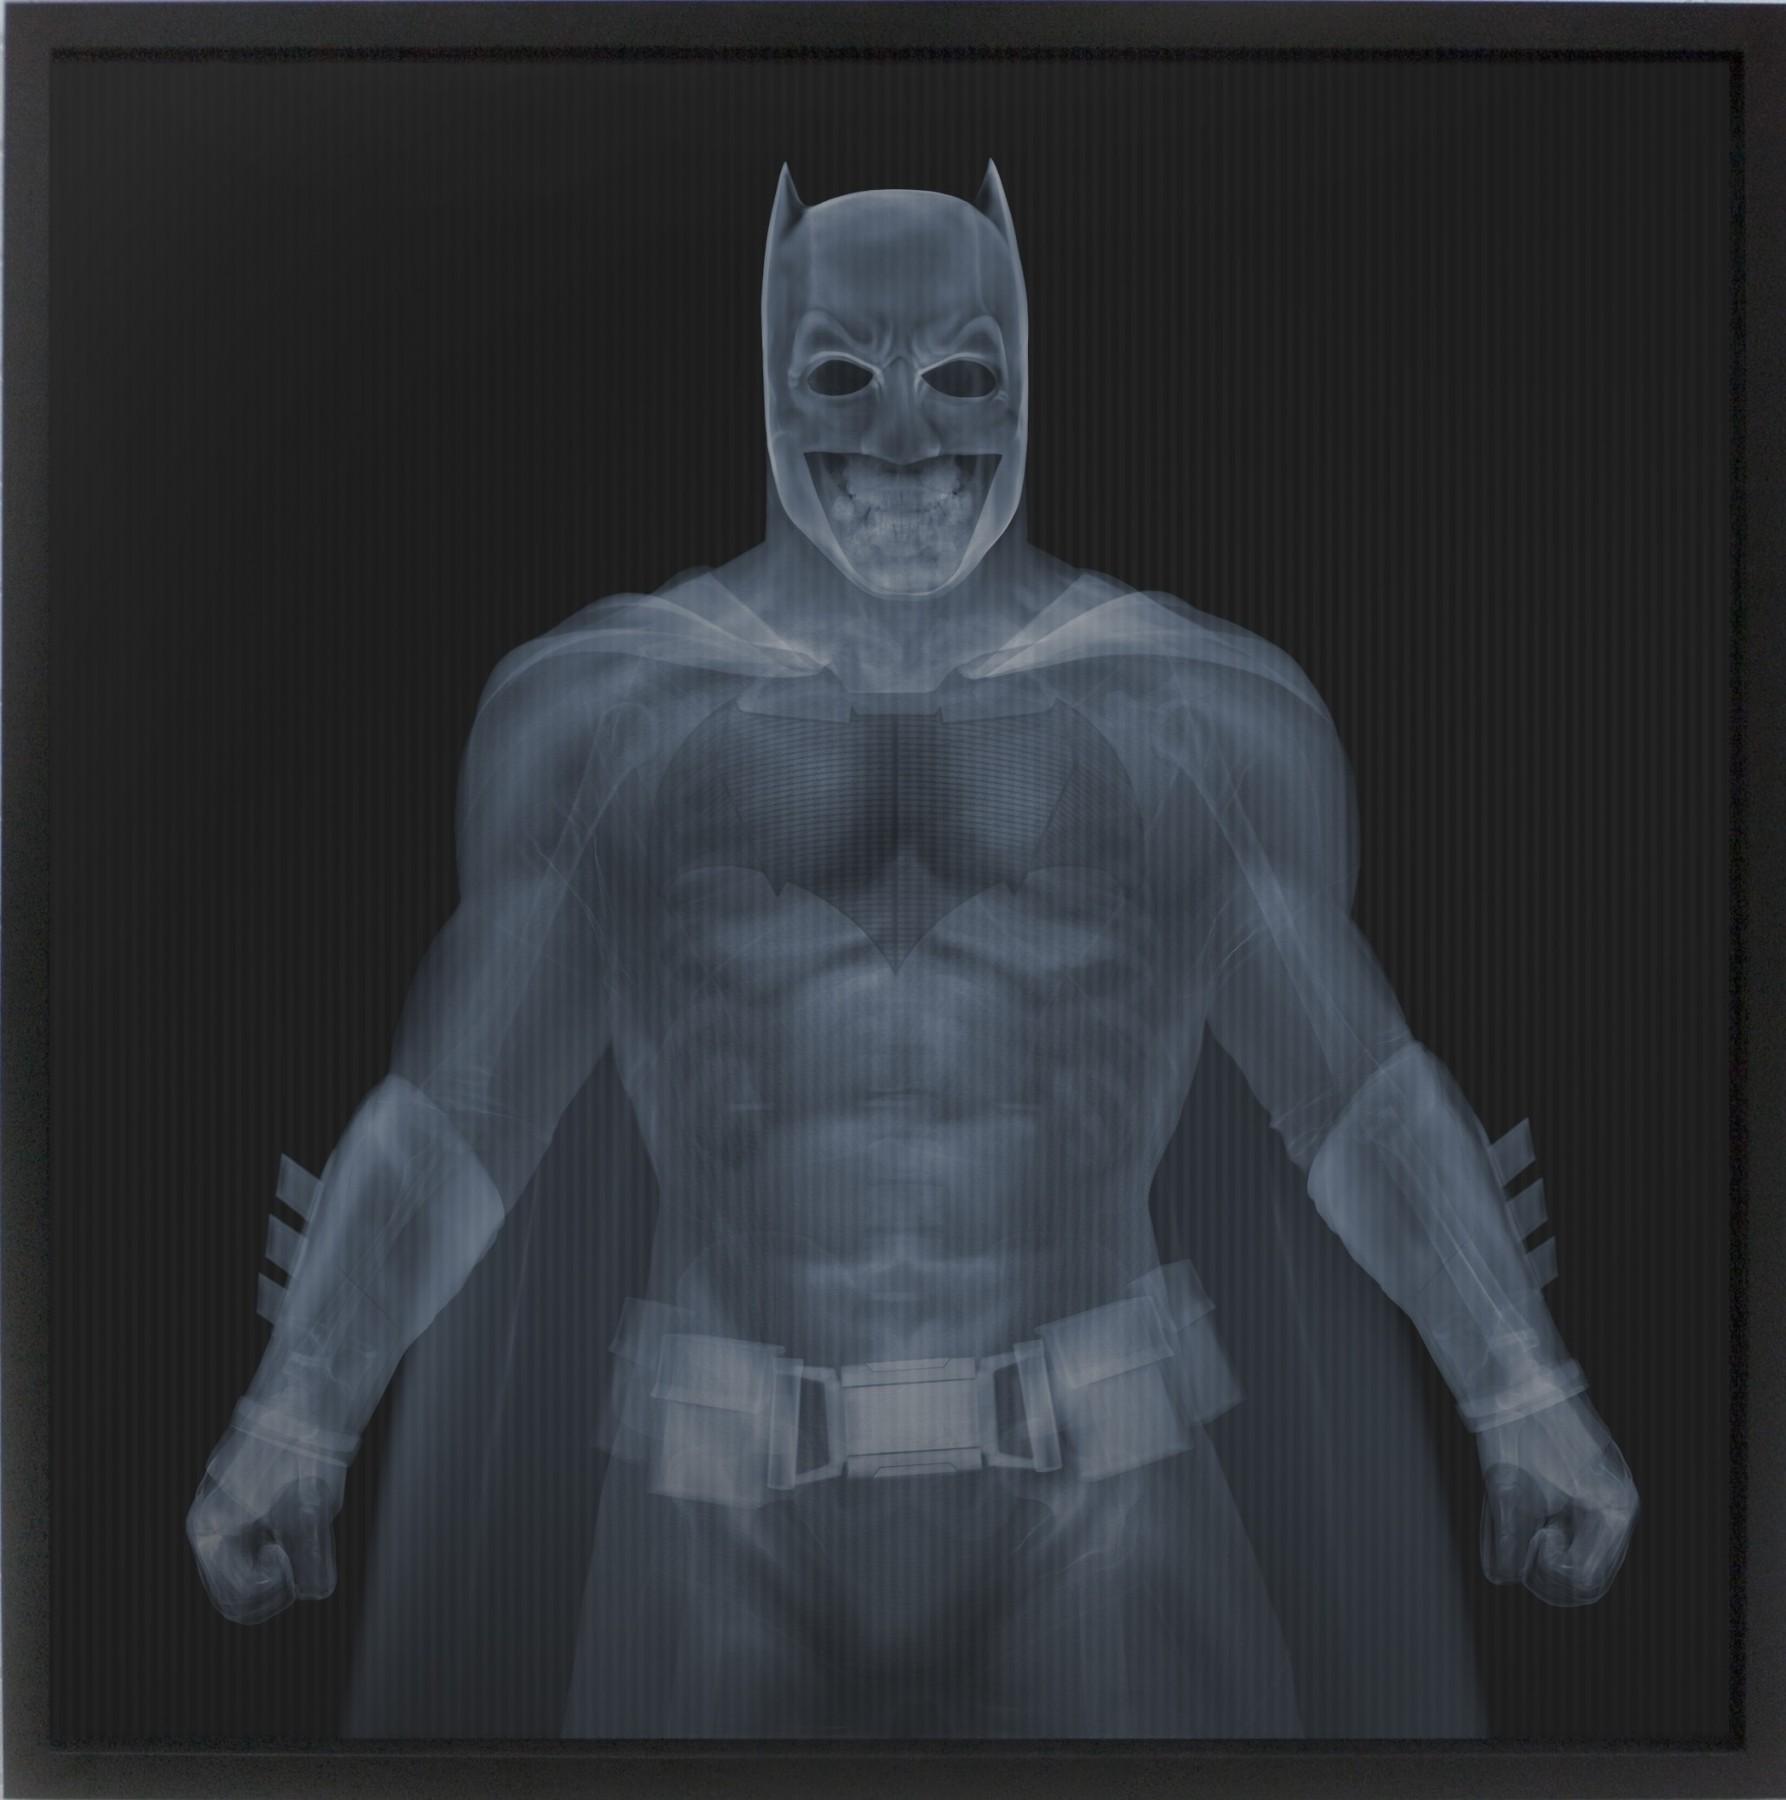 1.-BvS-Batman